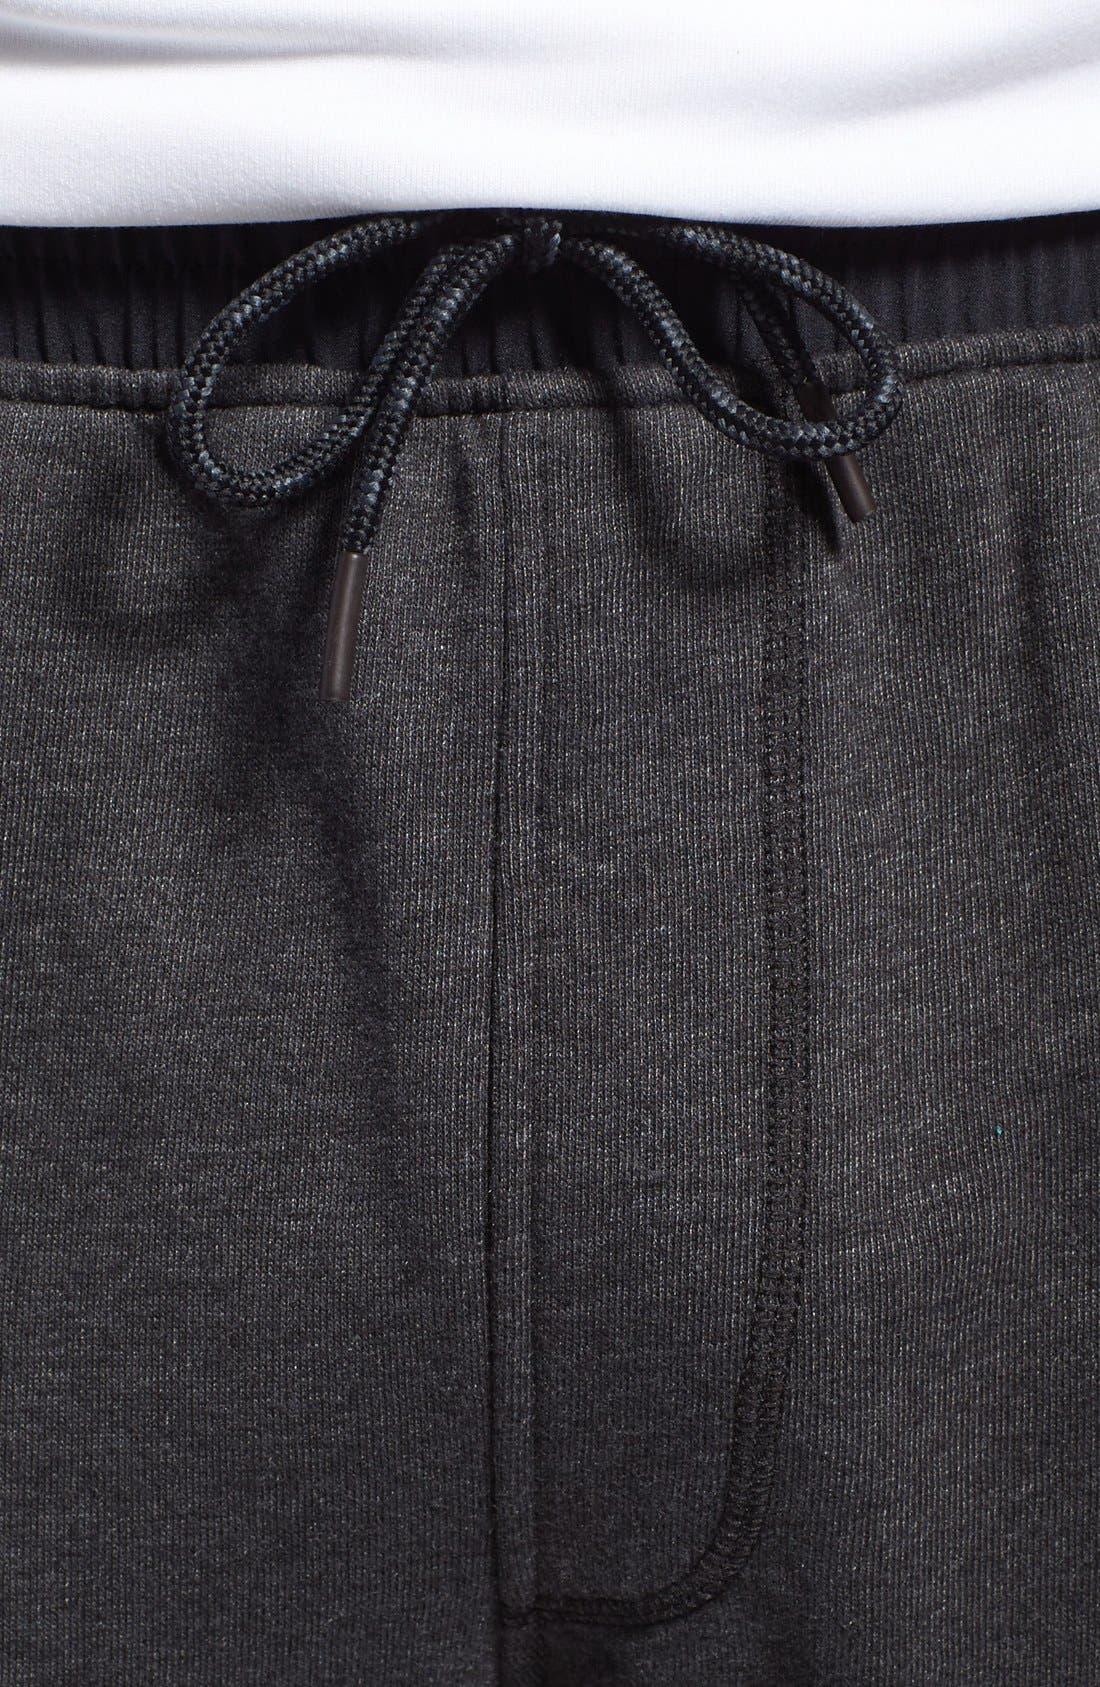 Cutoff Sweatpants,                             Alternate thumbnail 3, color,                             005